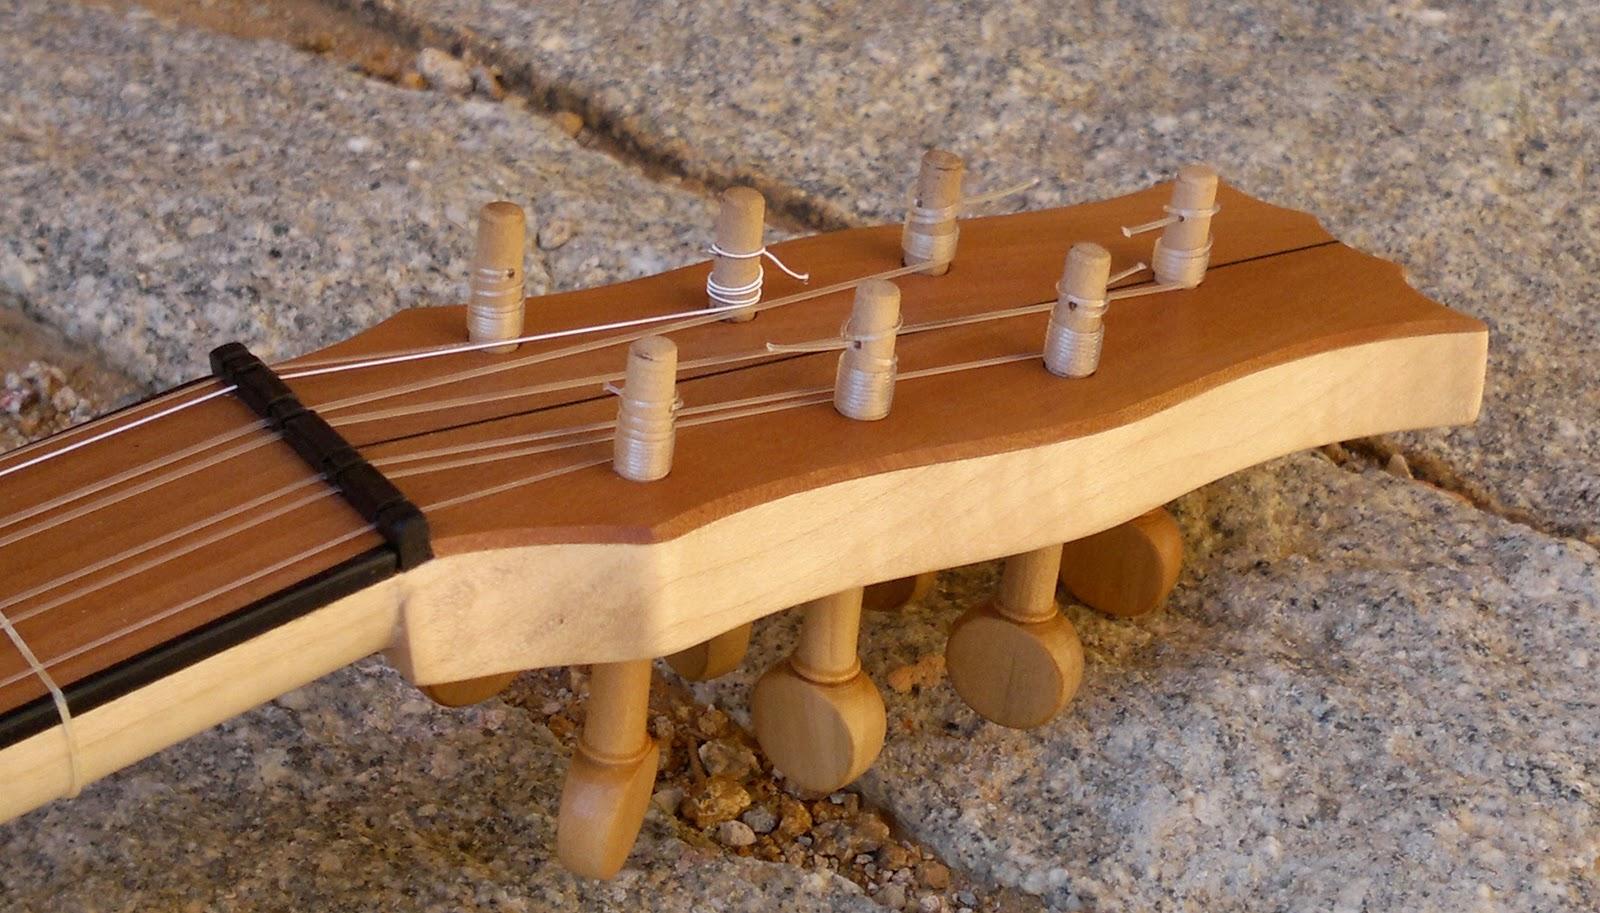 guitare-renaissance-ugo-casalonga-4.jpg